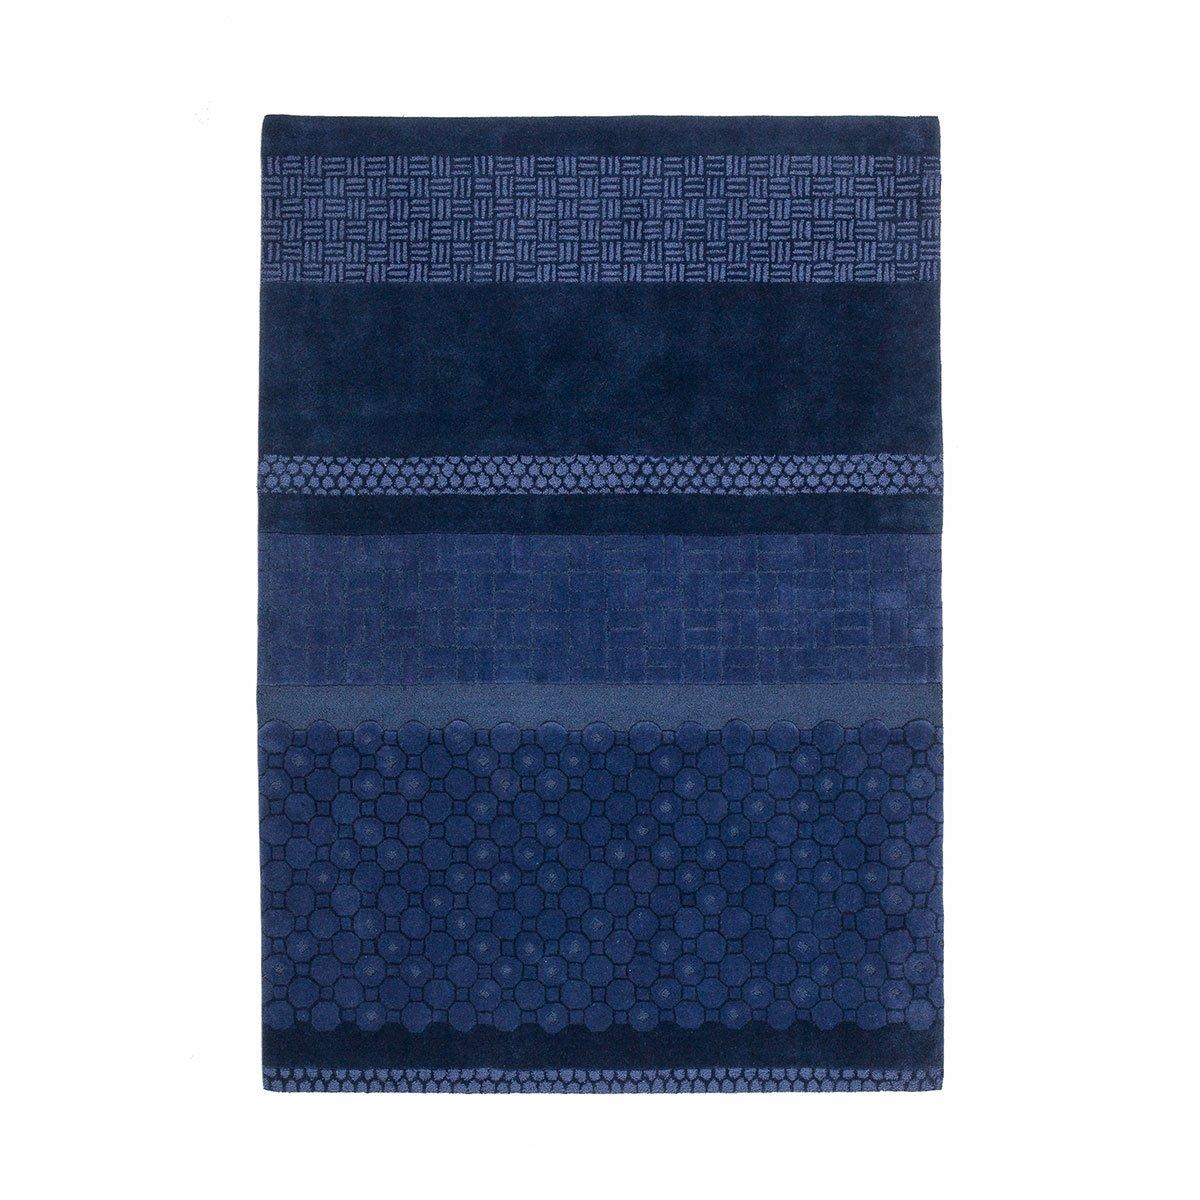 Nanimarquina Jie Vloerkleed Blauw - l. 240 x b. 170 cm.